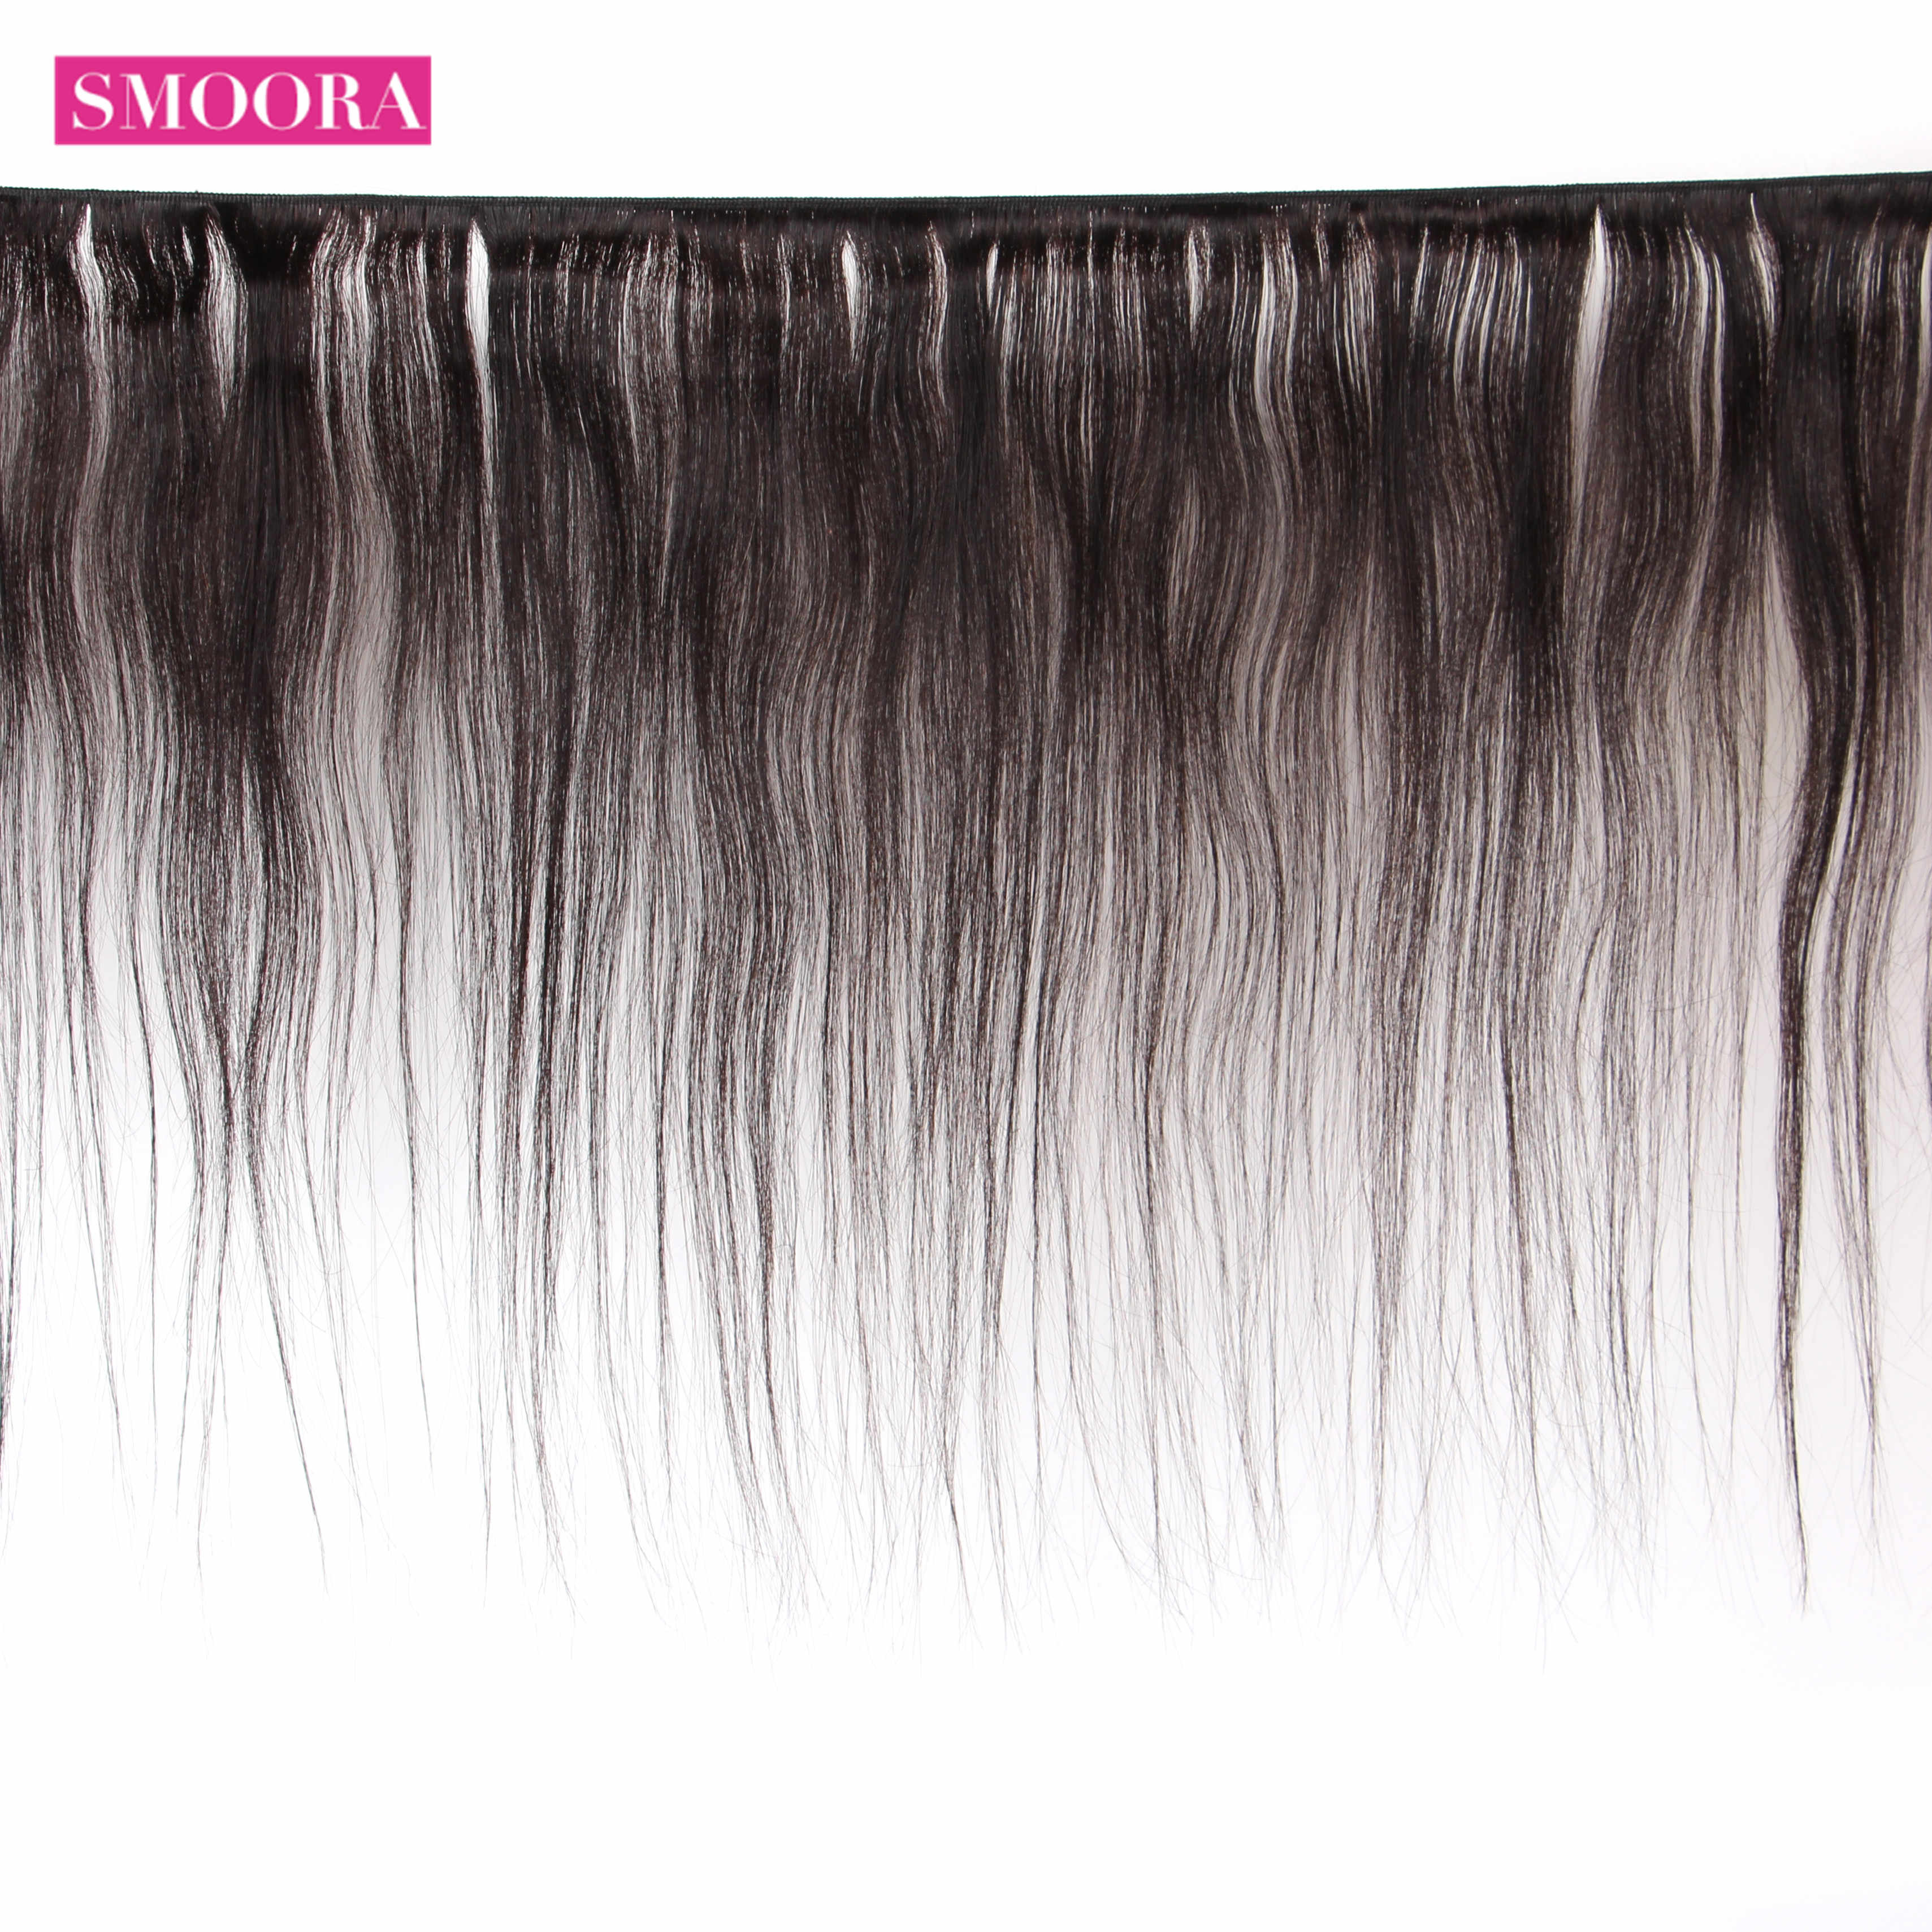 Smoora 8-28 Inch Braziliaanse Hair Weave Bundels Straight 100% Non-Remy Human Hair Bundels 1 3 4 stuks/partij Natuurlijke Kleur